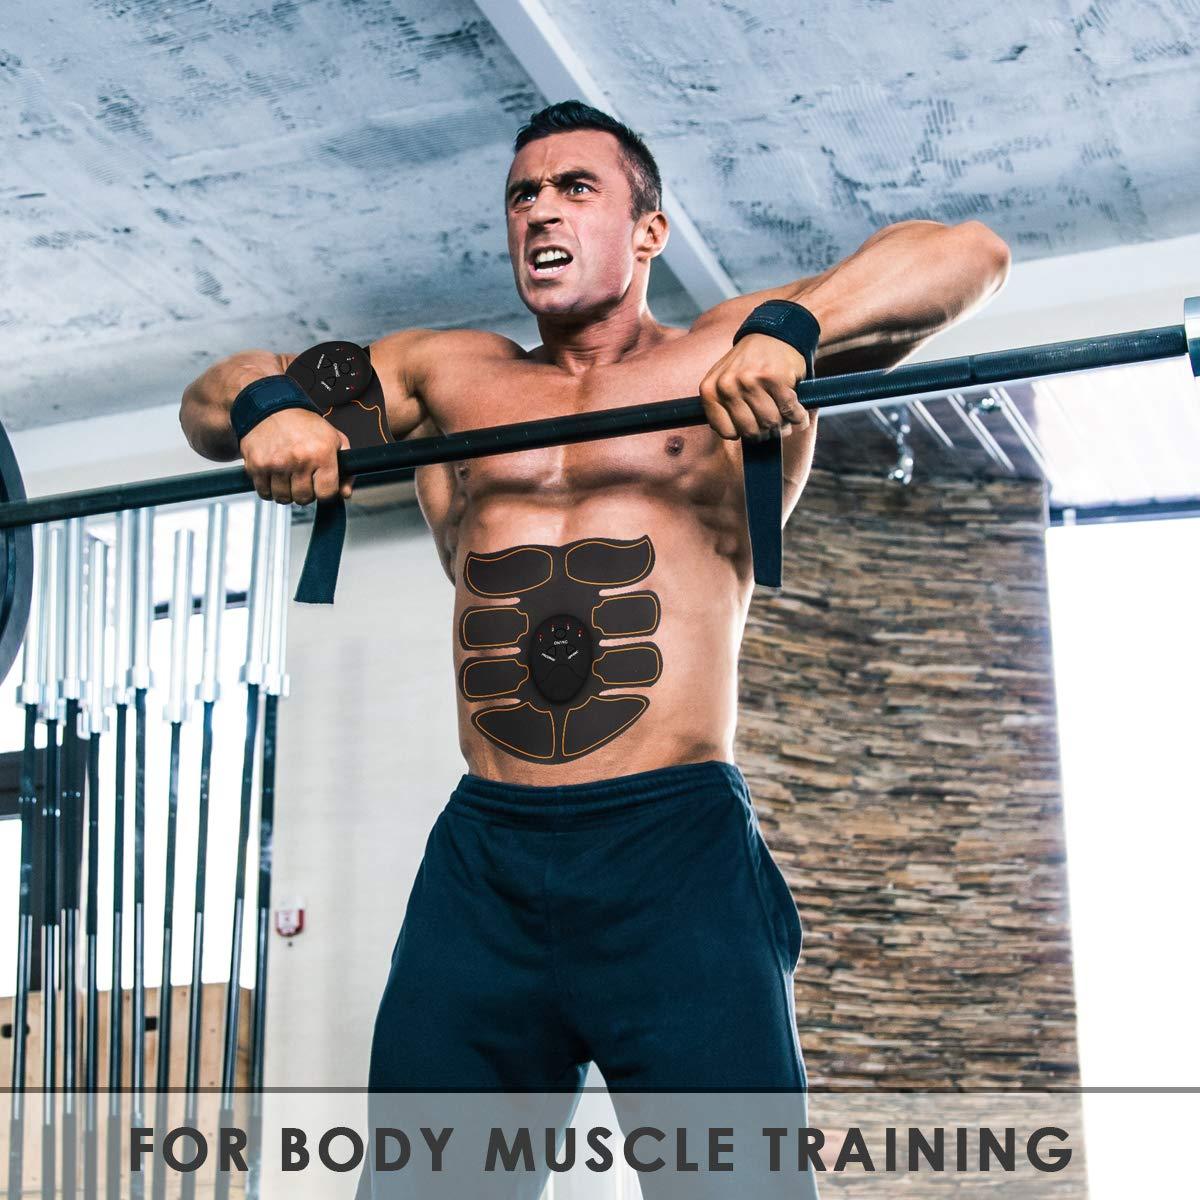 Massage Muscles Kit Muscular Stimulator Arm gluteal apparatus Free Legs Thighs kames skoss prestige Abdominal Belt Electrostimulation EMS trainer abdominal